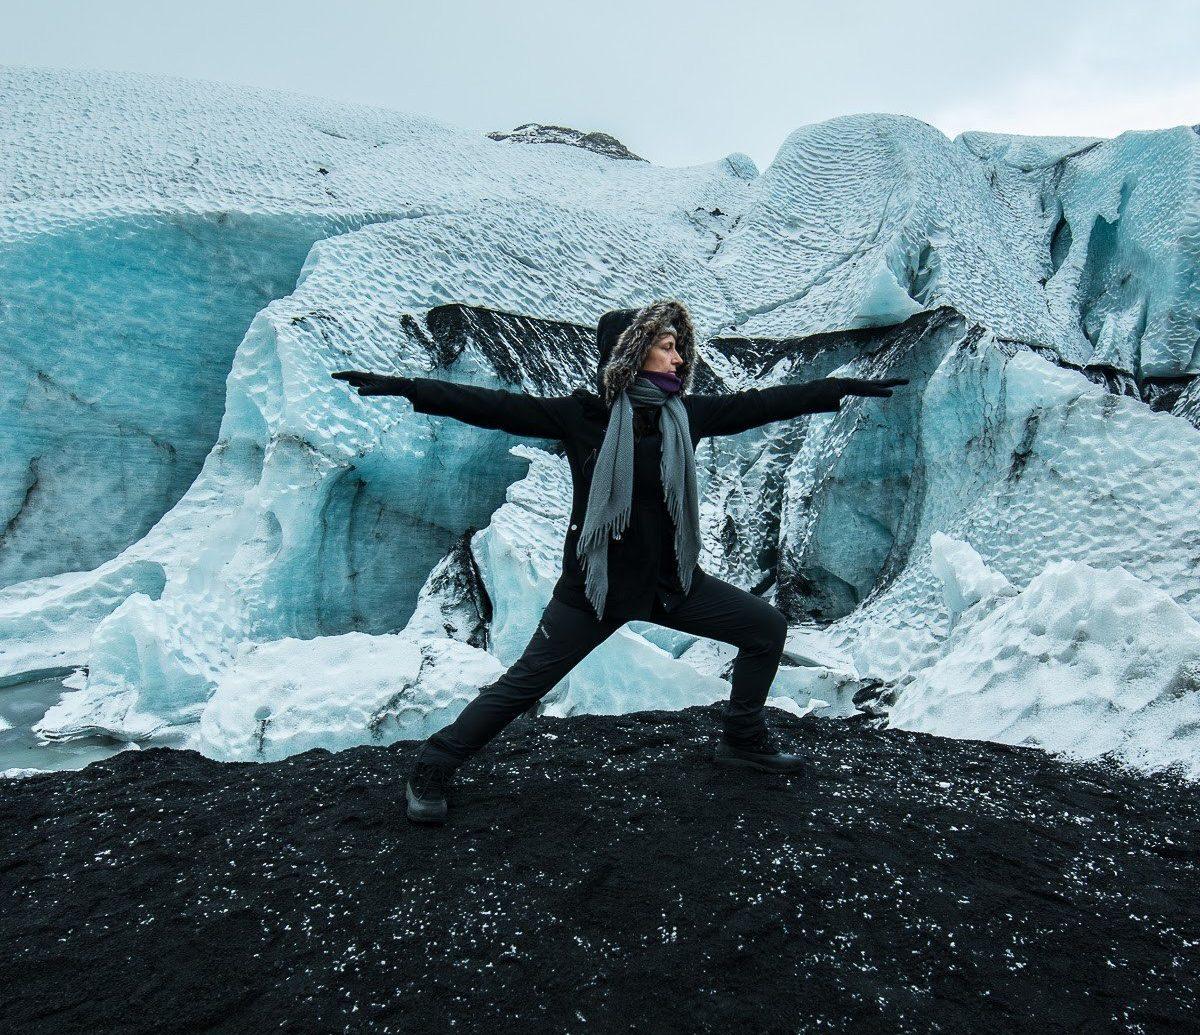 Health + Wellness Meditation Retreats Trip Ideas Yoga Retreats outdoor ice Nature glacier iceberg Ocean glacial landform wave Sea extreme sport arctic terrain